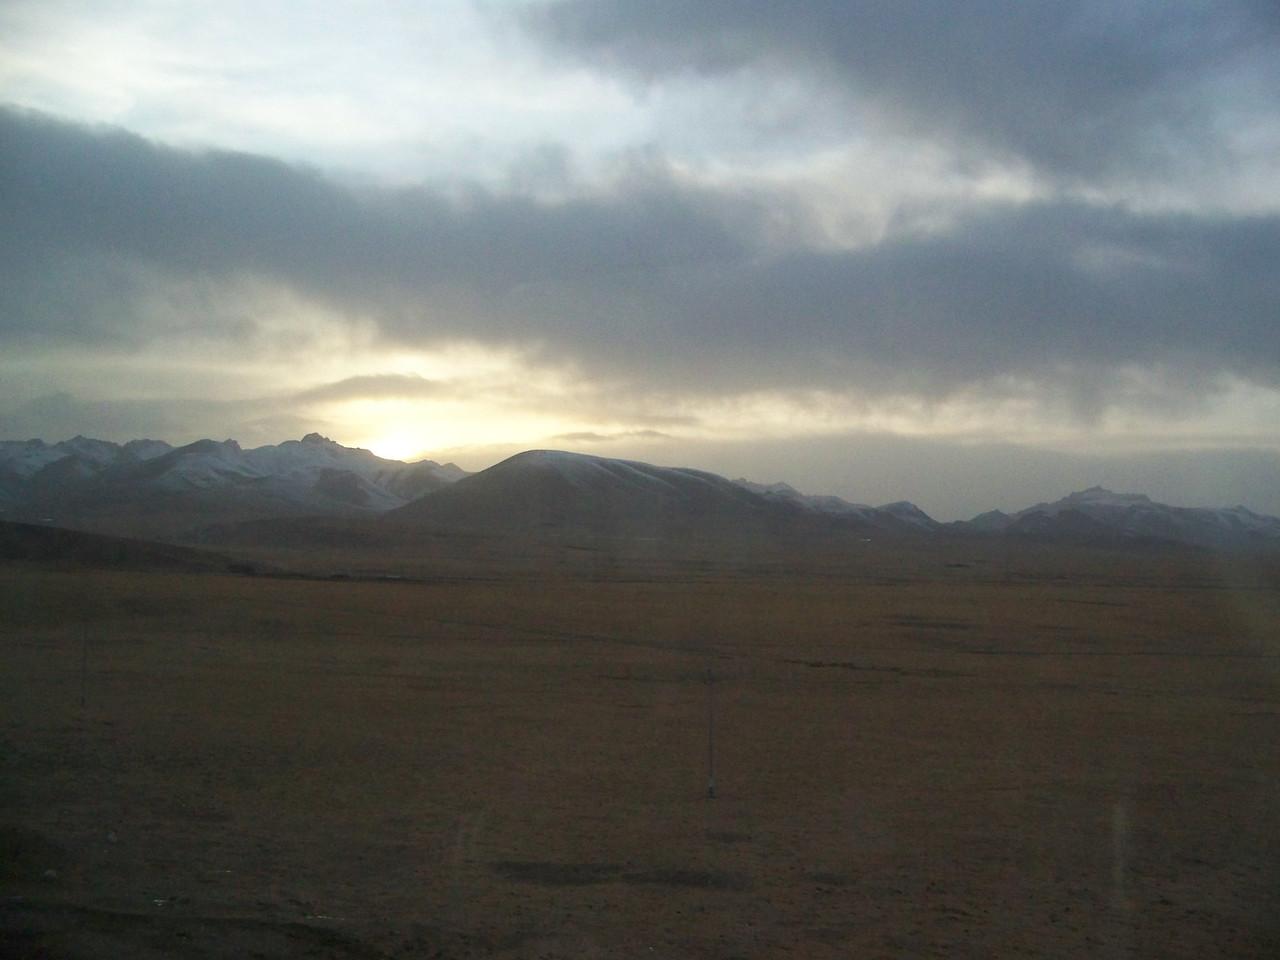 0091 - Scenery on Train Trip Between Beijing and Lhasa.JPG